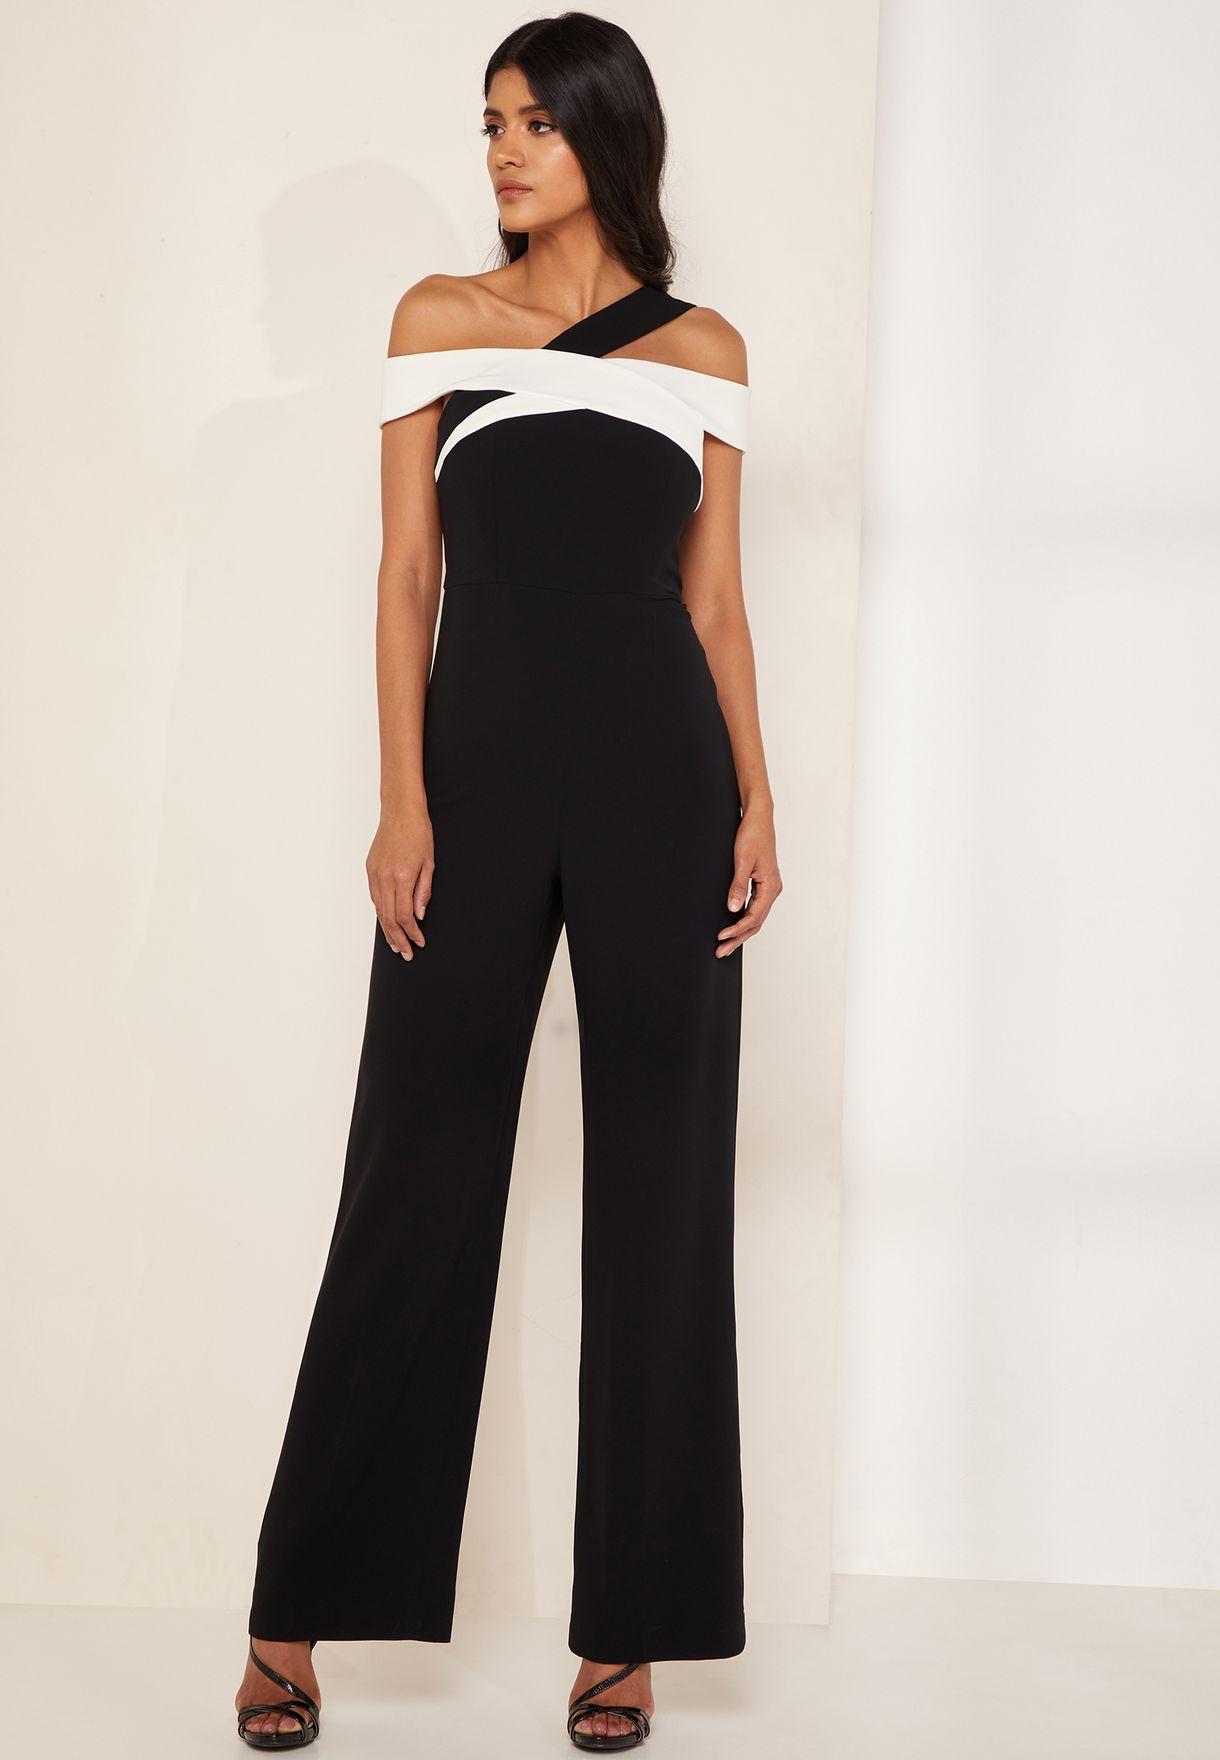 0cf00e83893 Shop Karen Millen black Colourblock Bardot Jumpsuit PE013 for Women ...